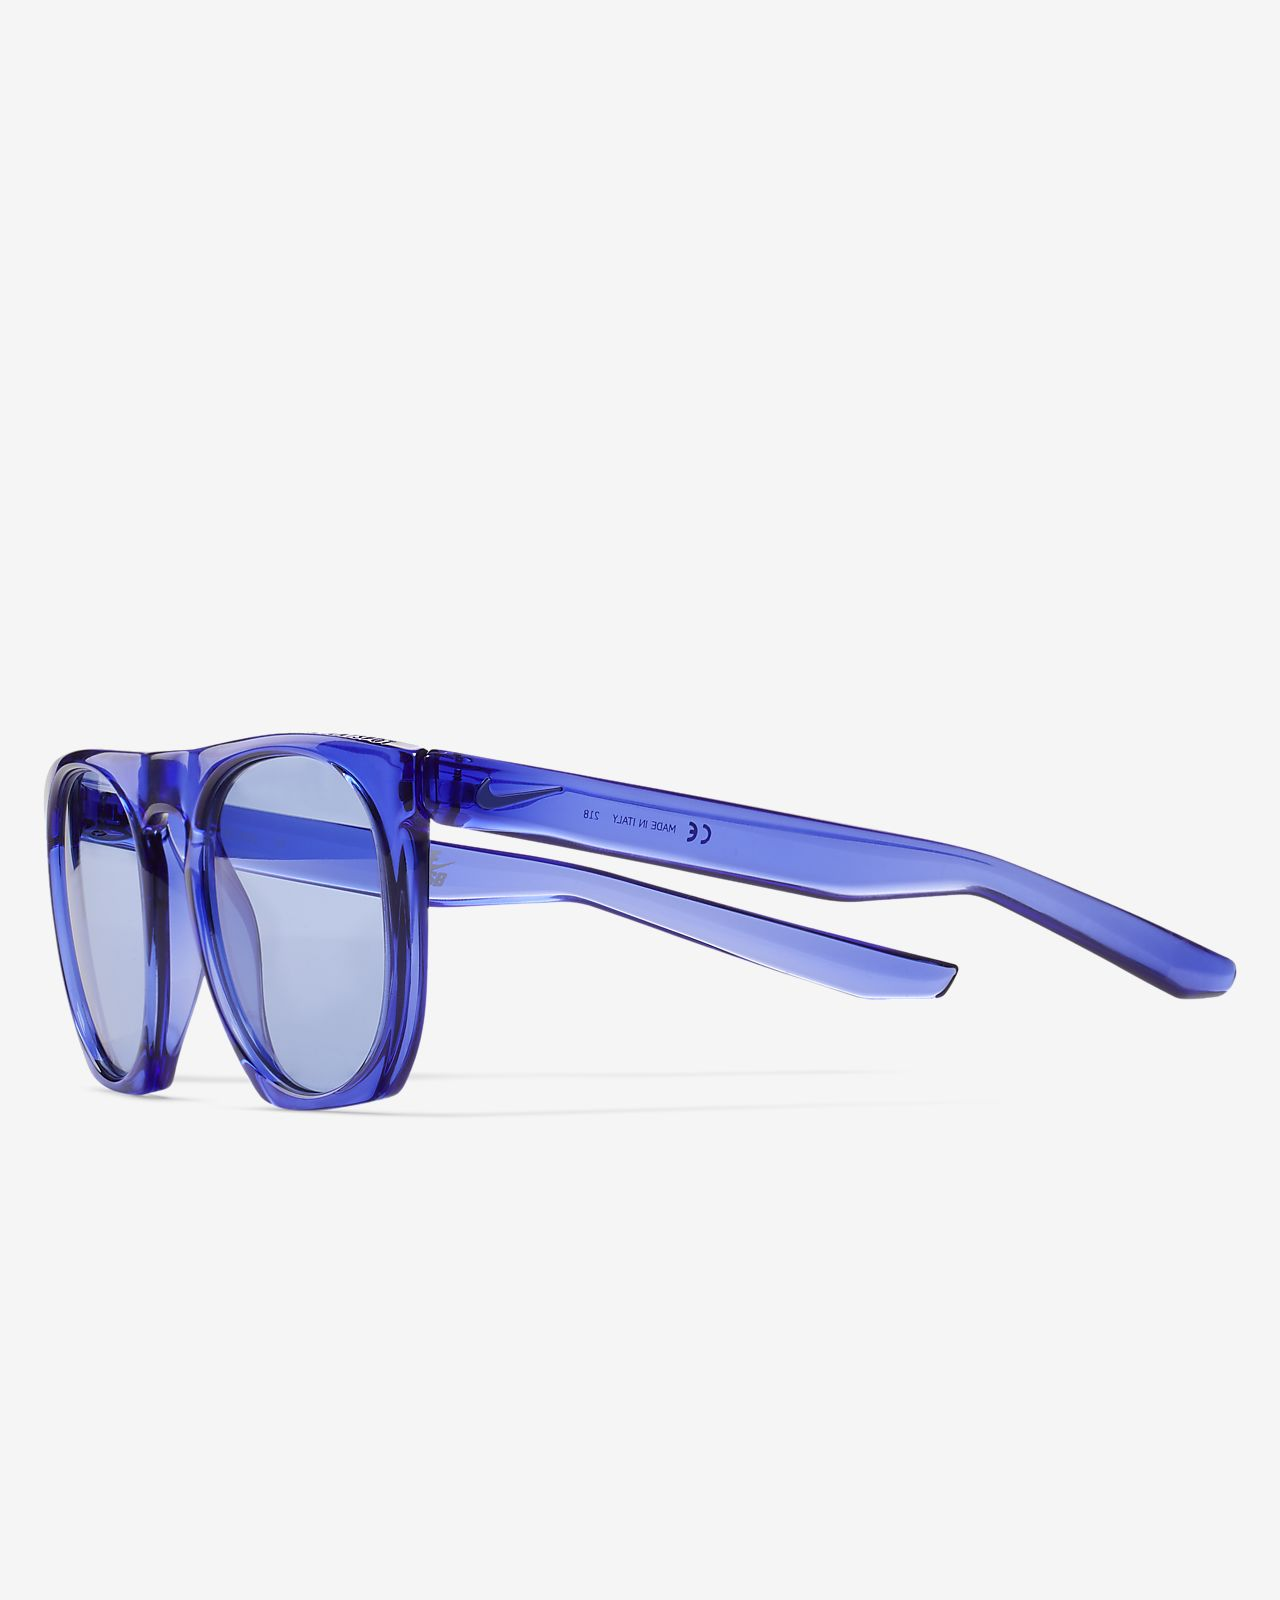 cf9ffd8aa8f9 Nike Flatspot Sunglasses. Nike.com